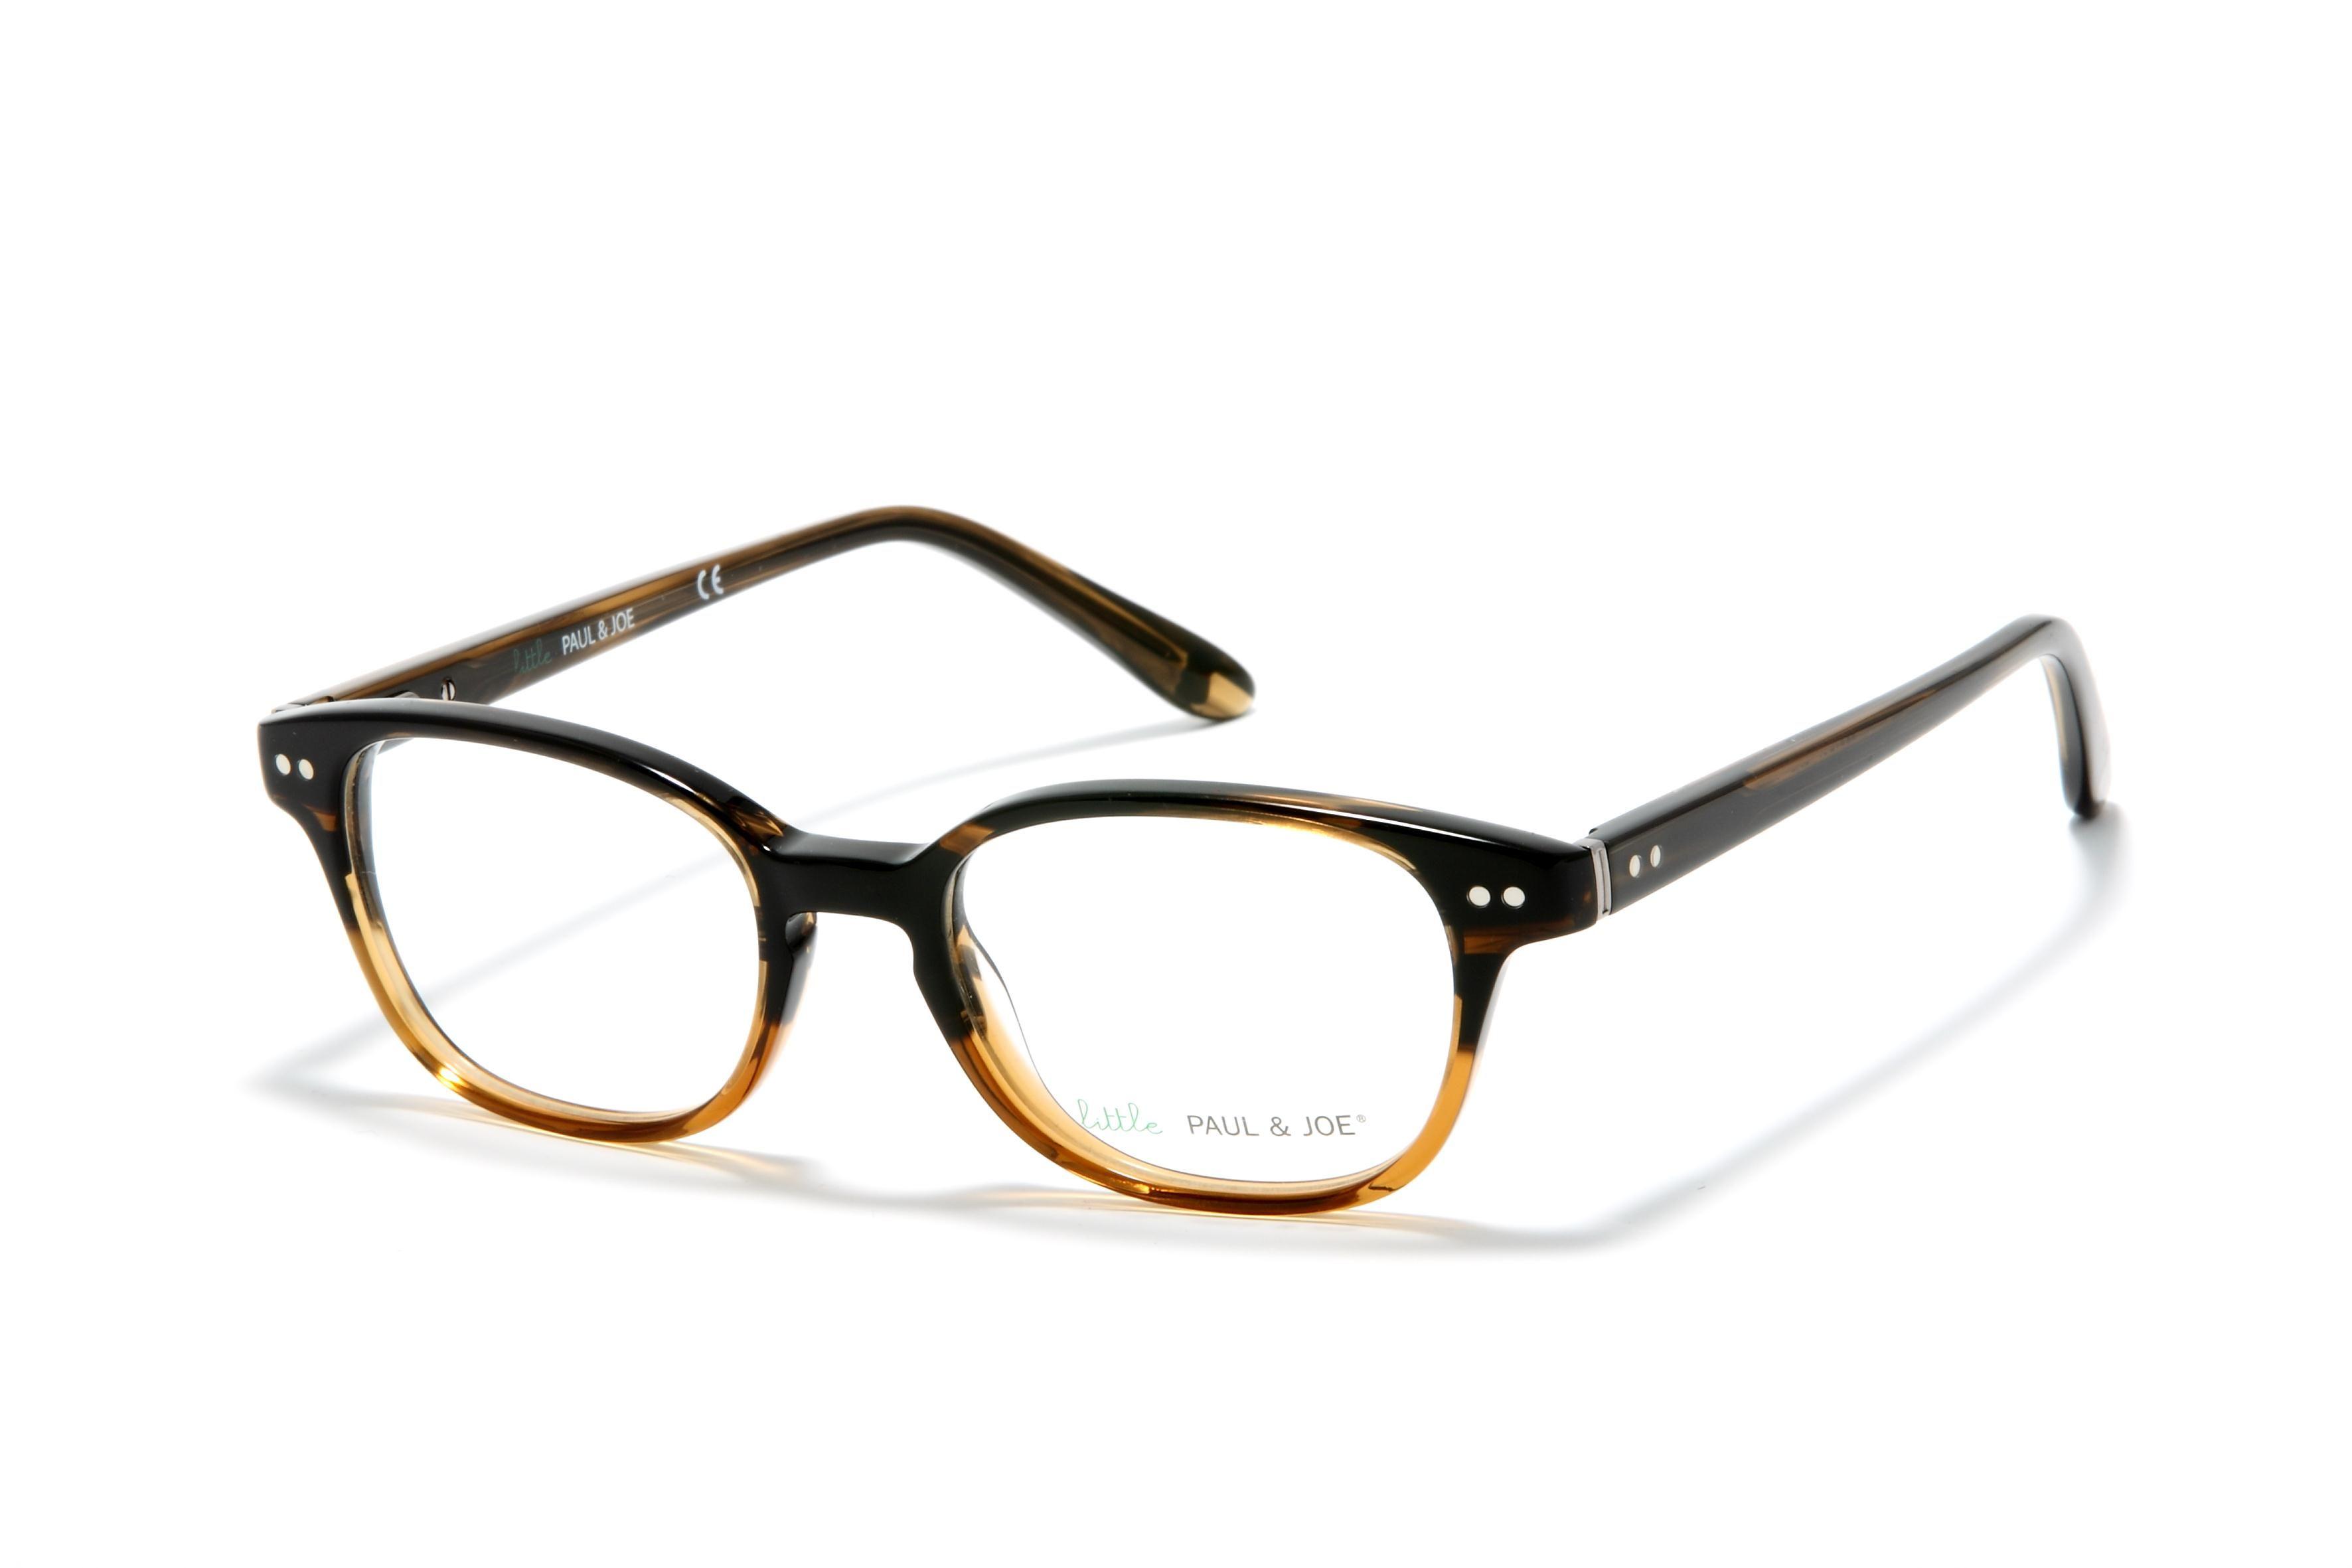 1c45ea225627e8 Lunettes Little Paul and Joe   lunnette   Optician, Paul, joe et Glasses